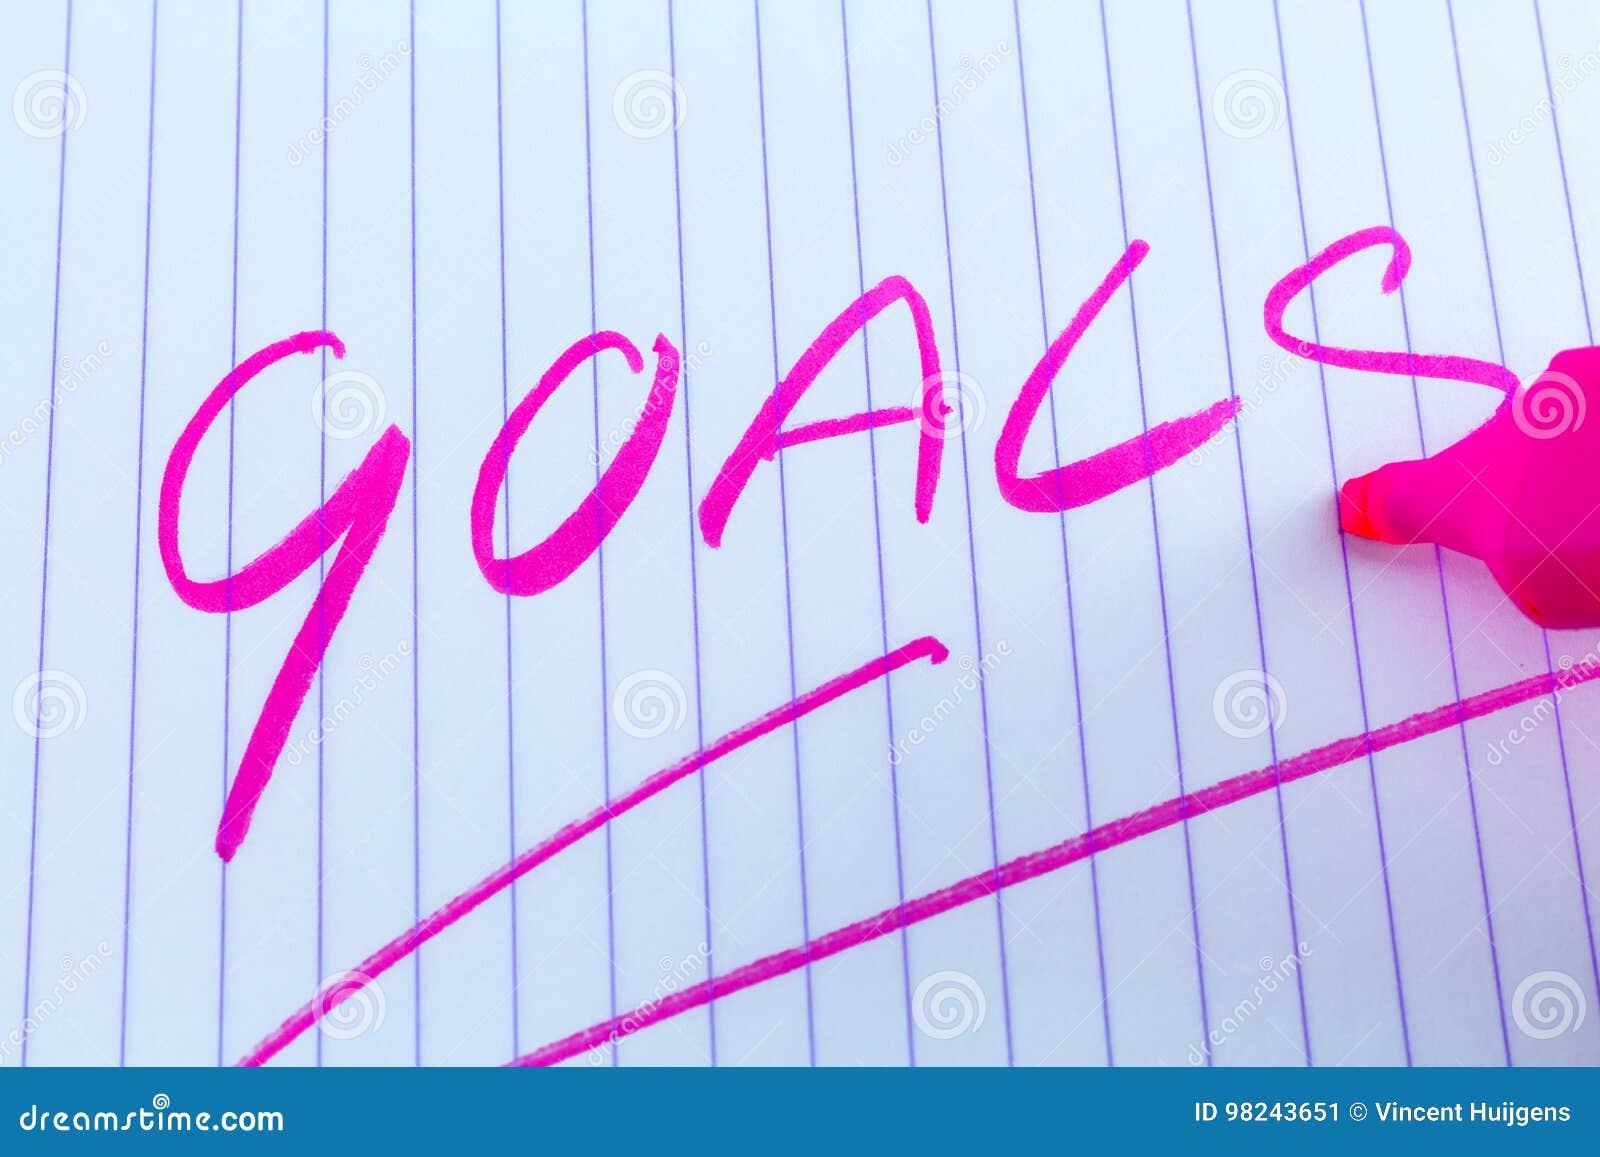 Goals keyword written with pink marker